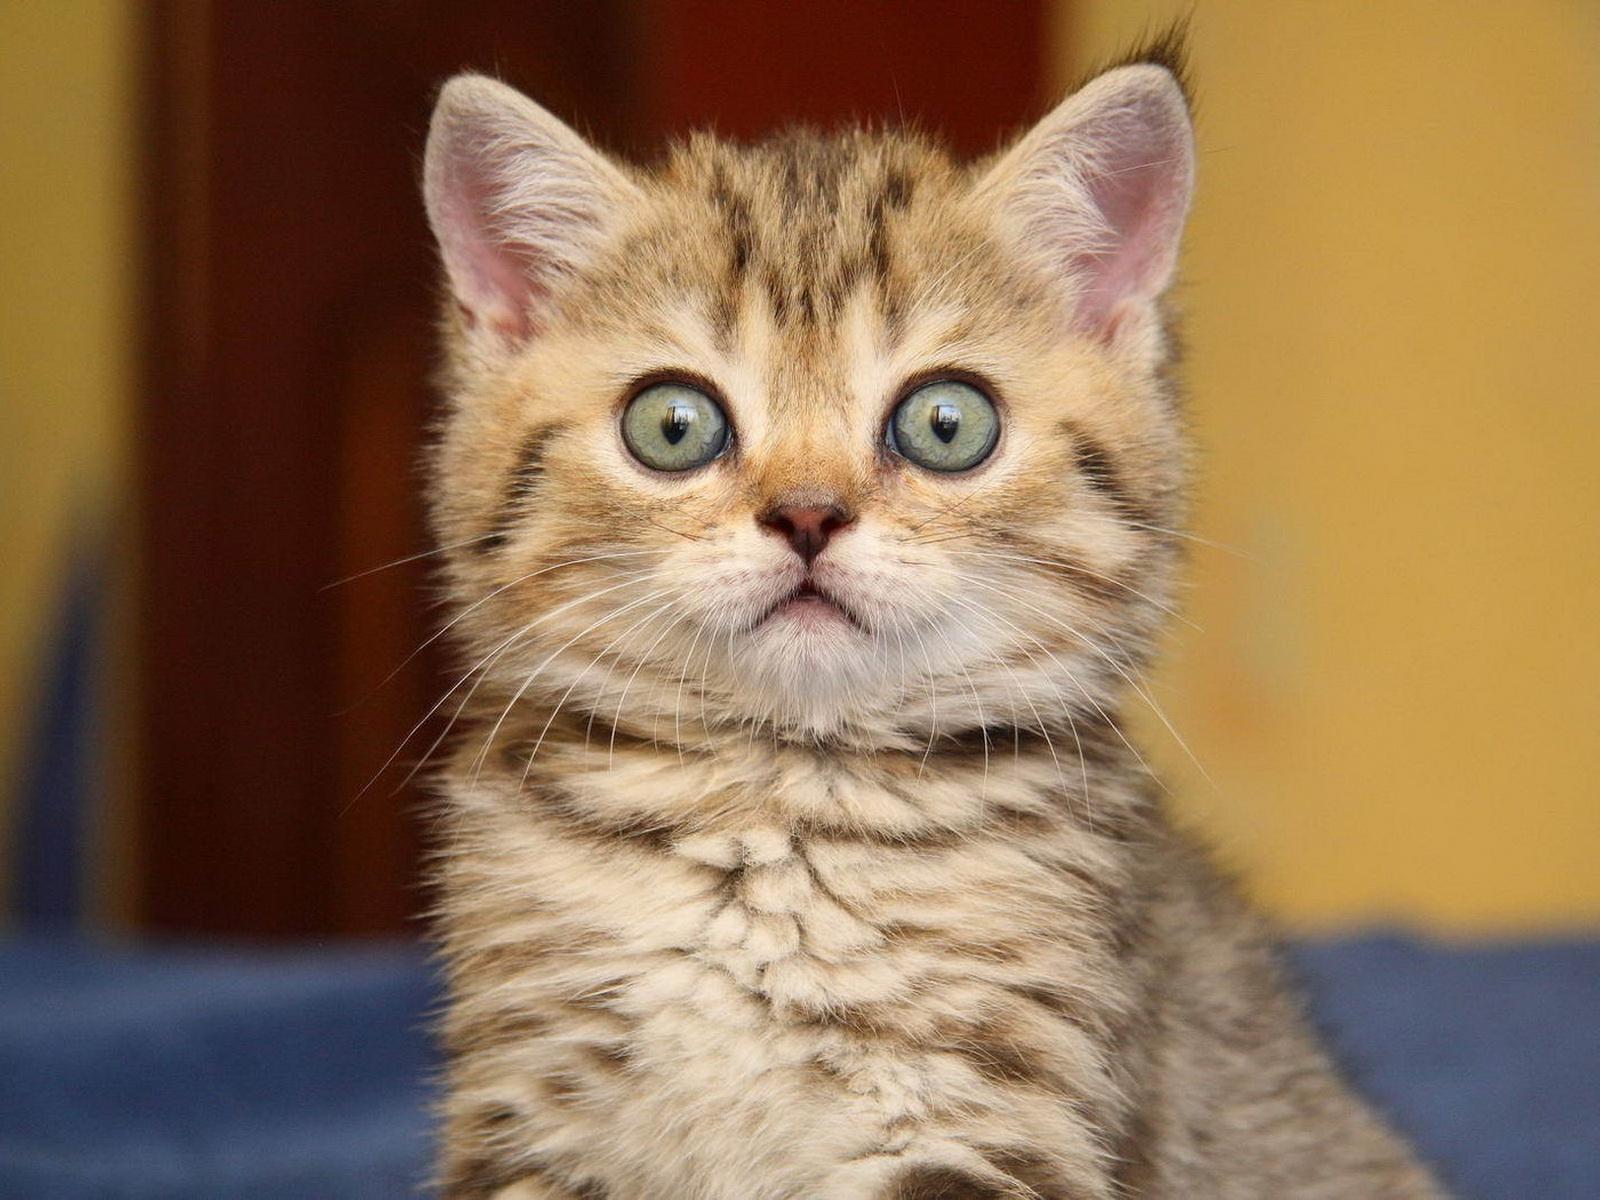 кадры картинки желающих кошек сразу решил, что